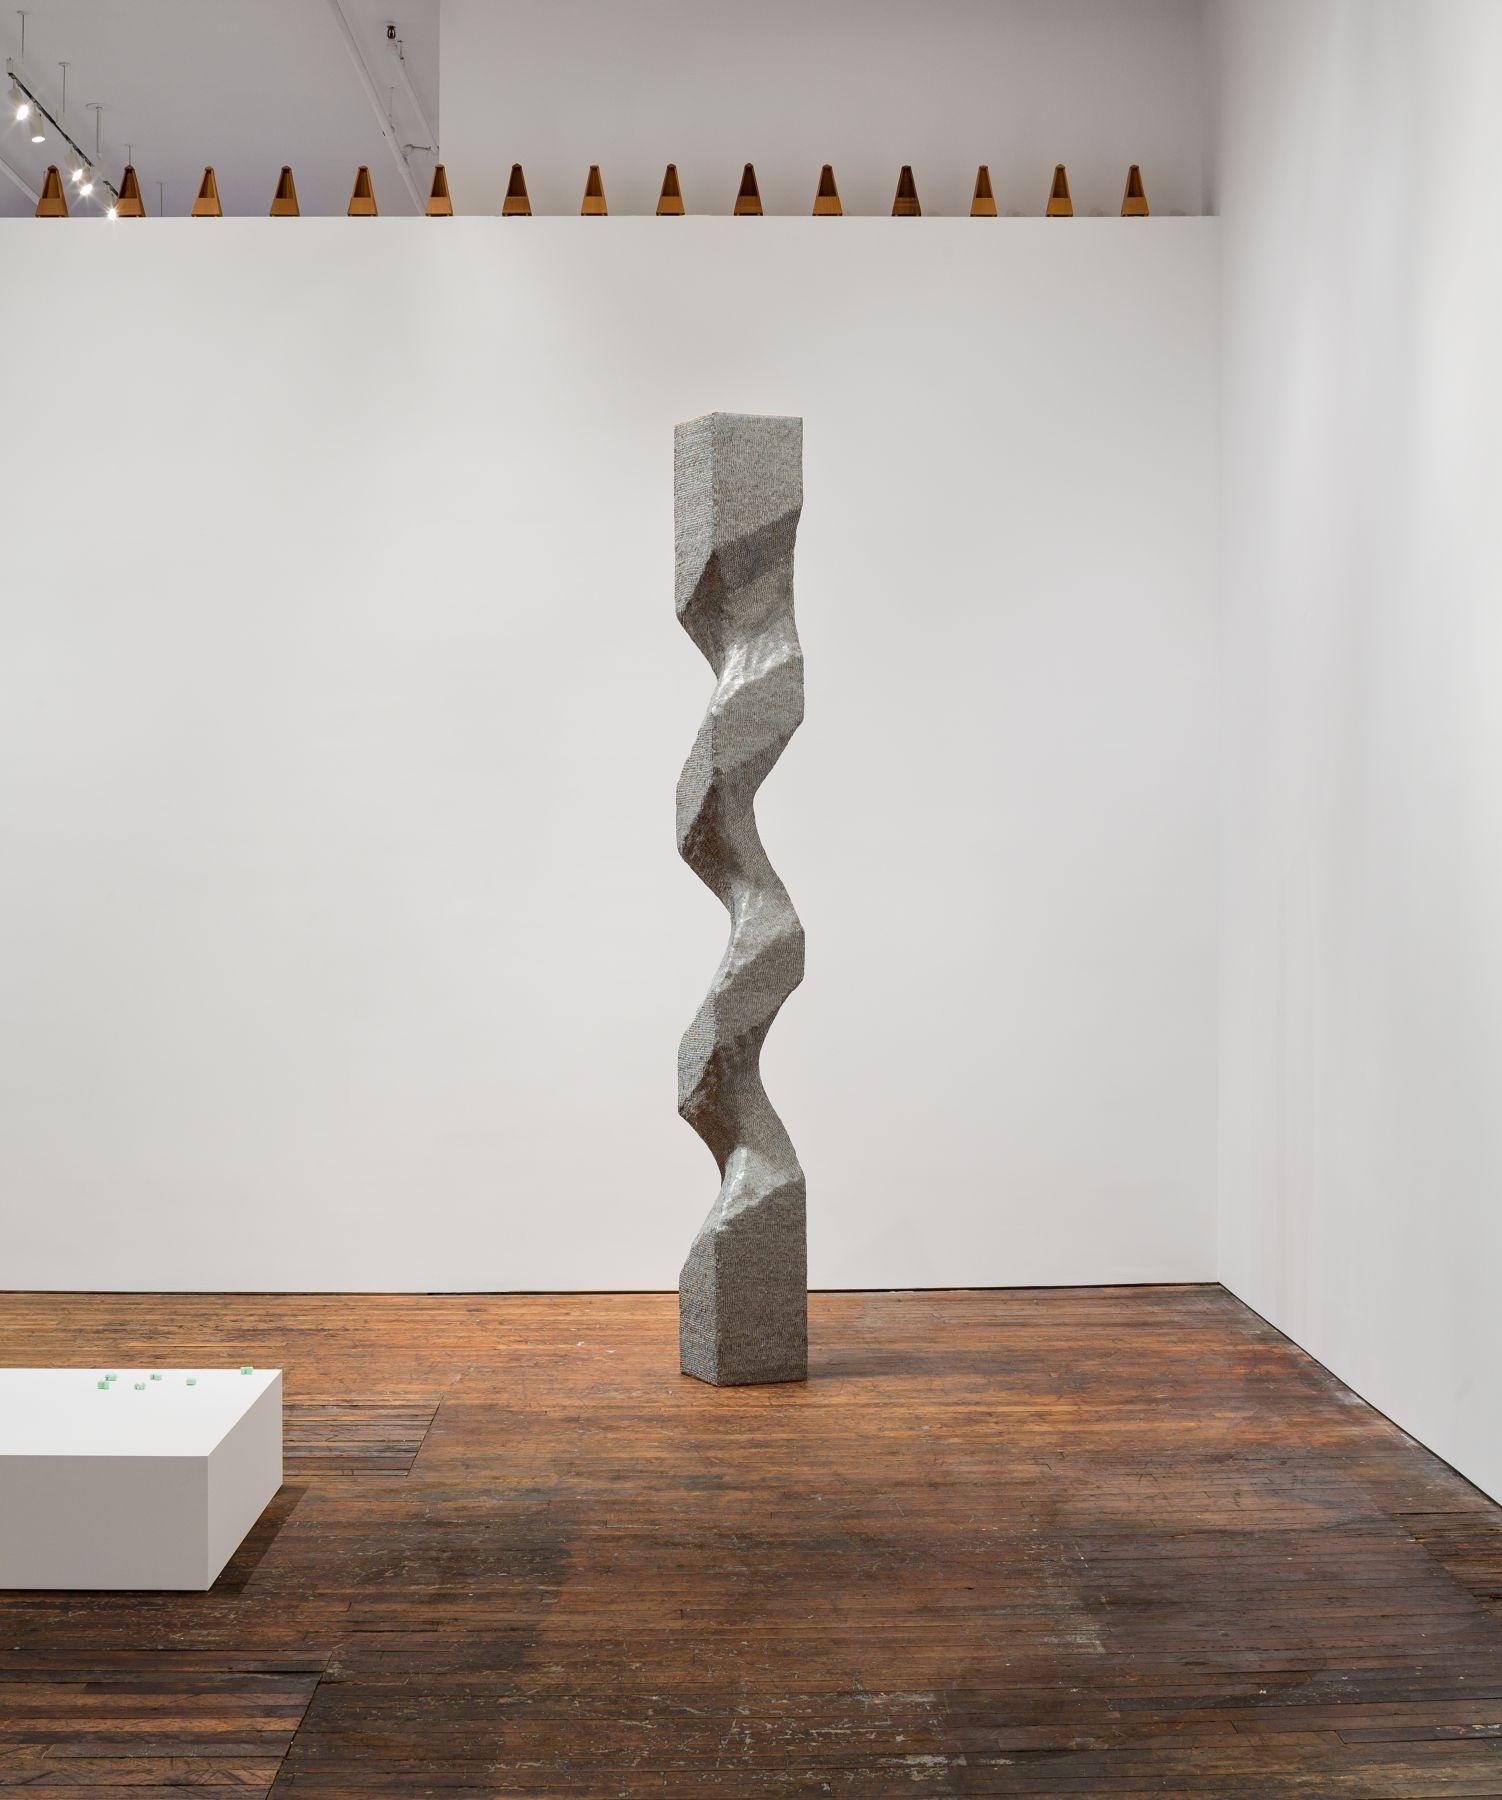 David Adamo, Peter Freeman, Inc., New York.